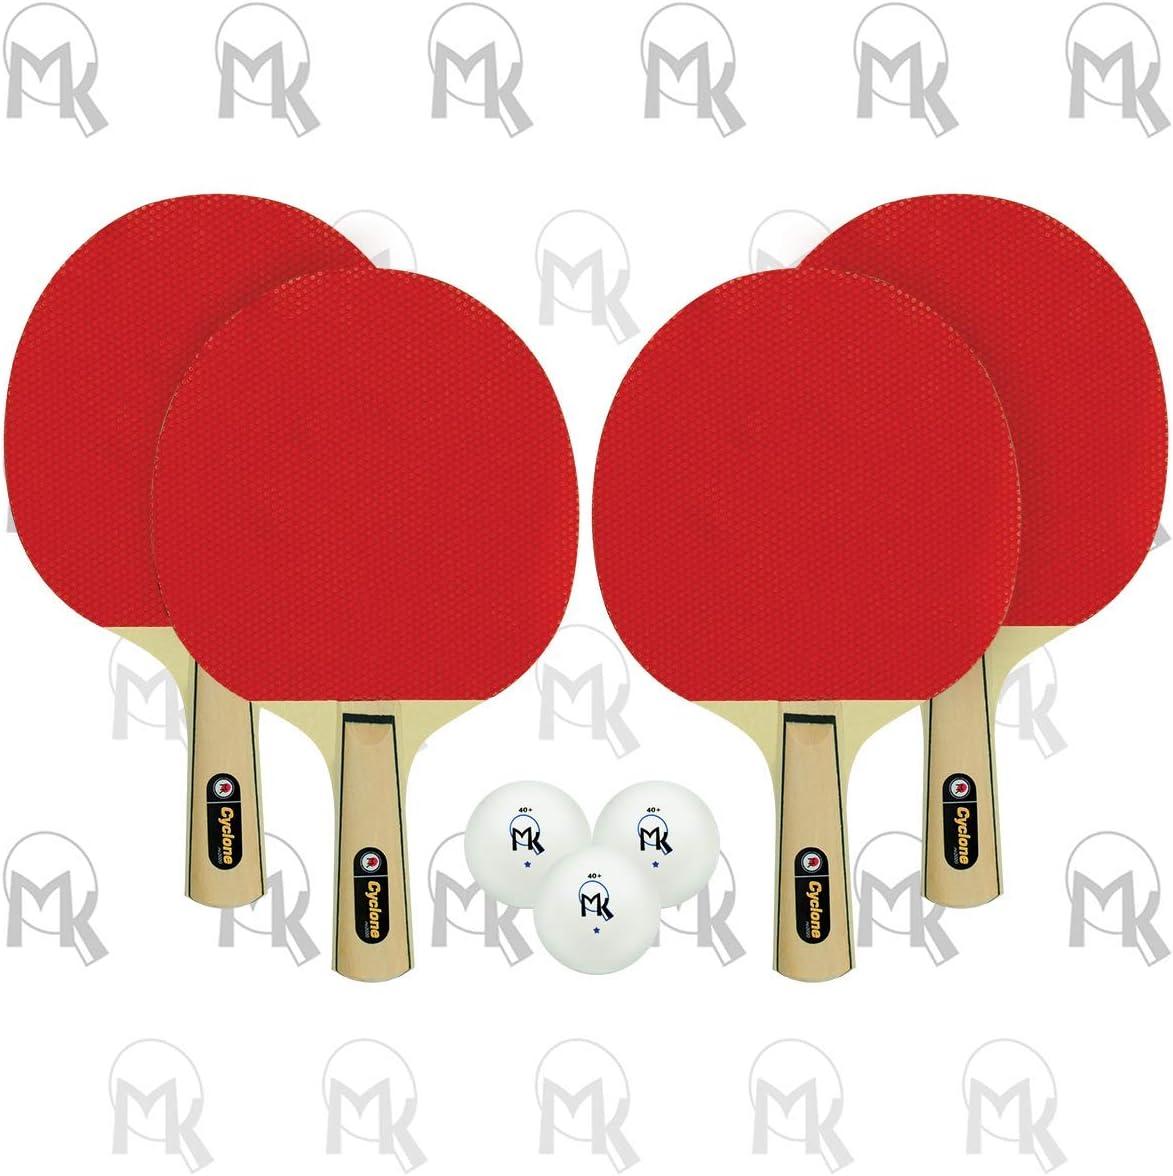 Martin Kilpatrick Cyclone Shakehand Table Tennis 4-Player Set Se